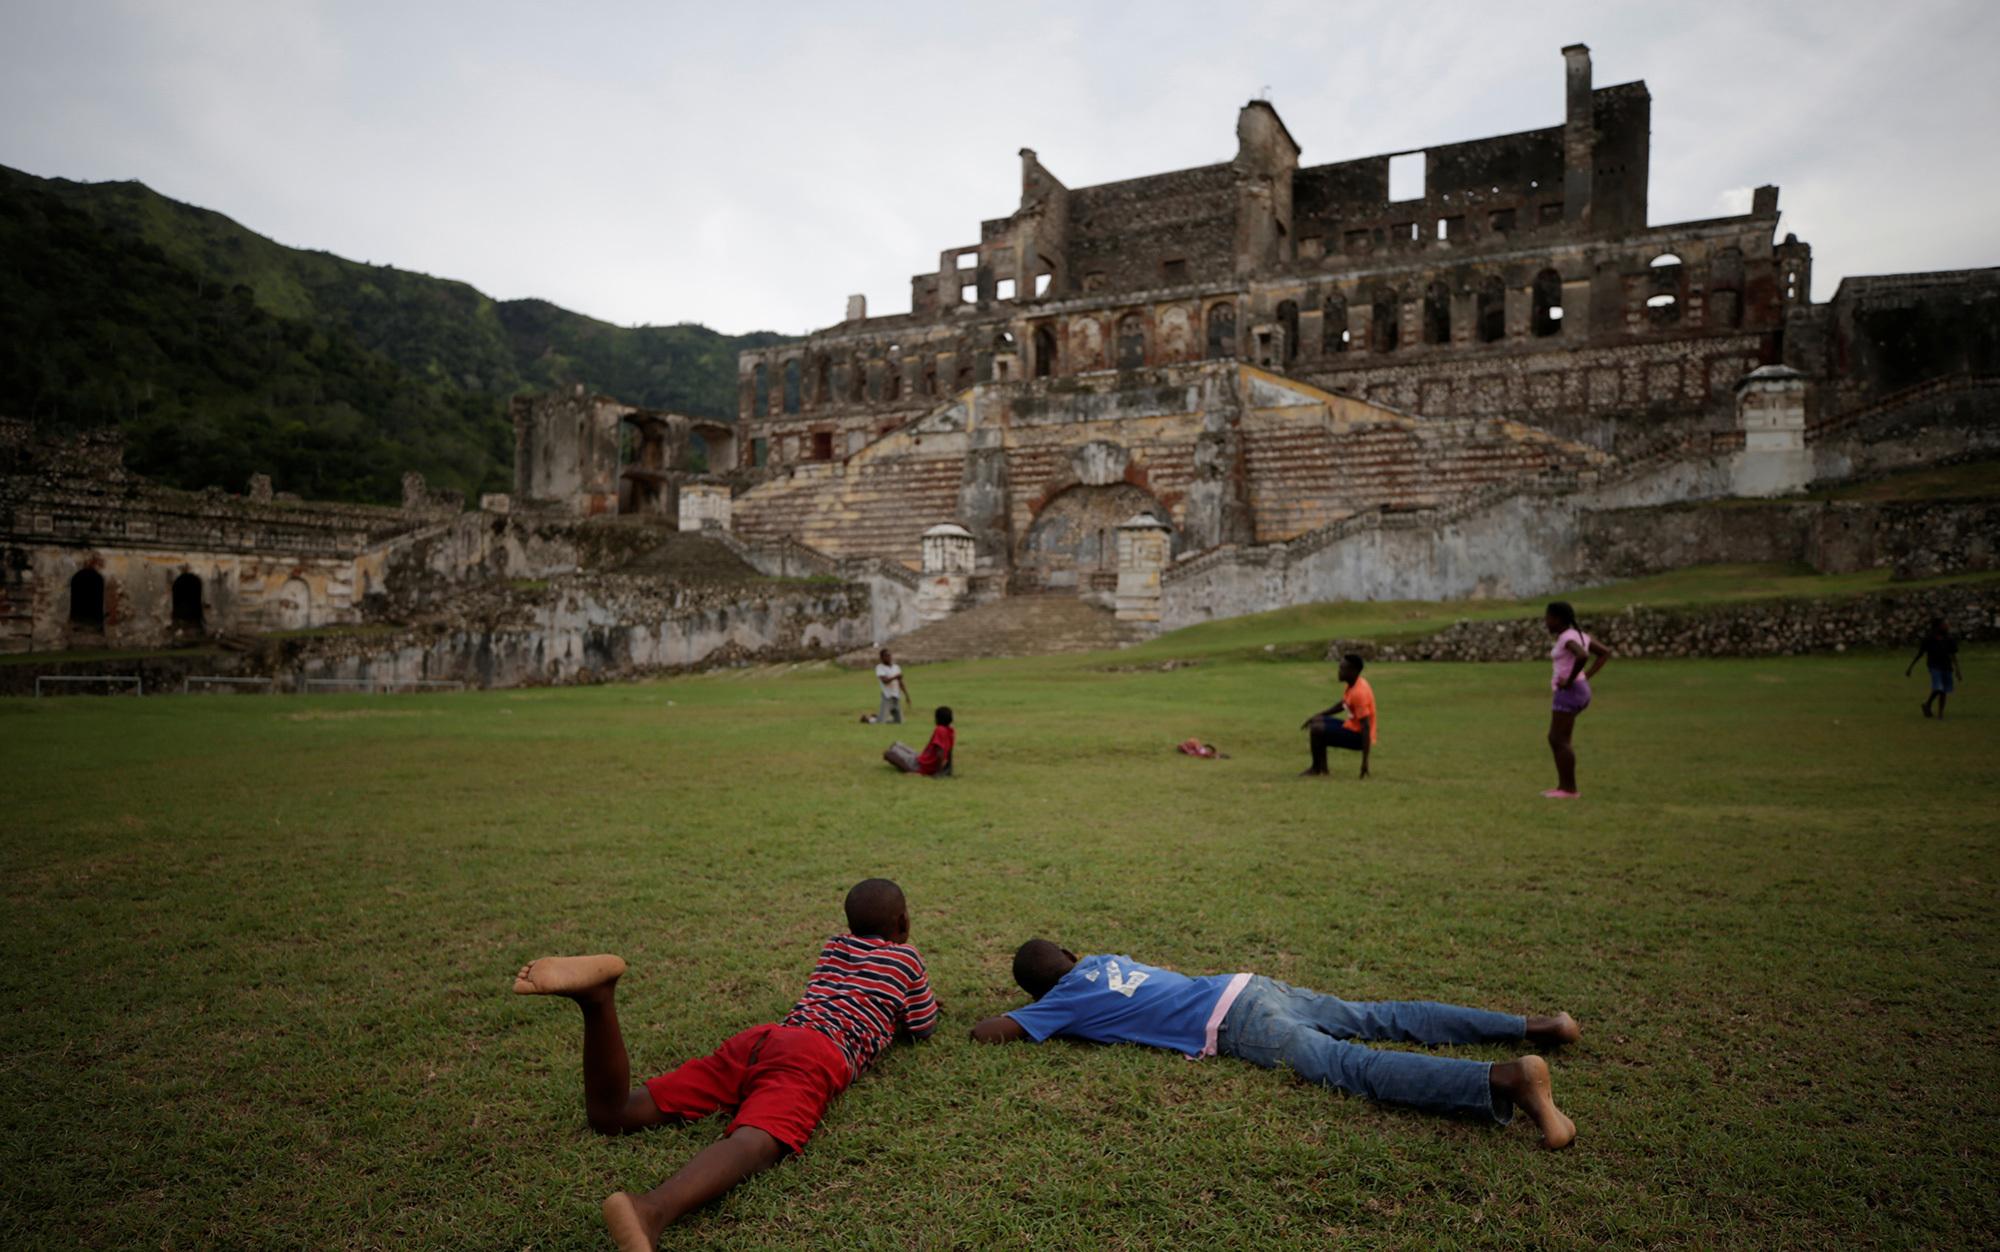 The king of Haiti's dream | Aeon